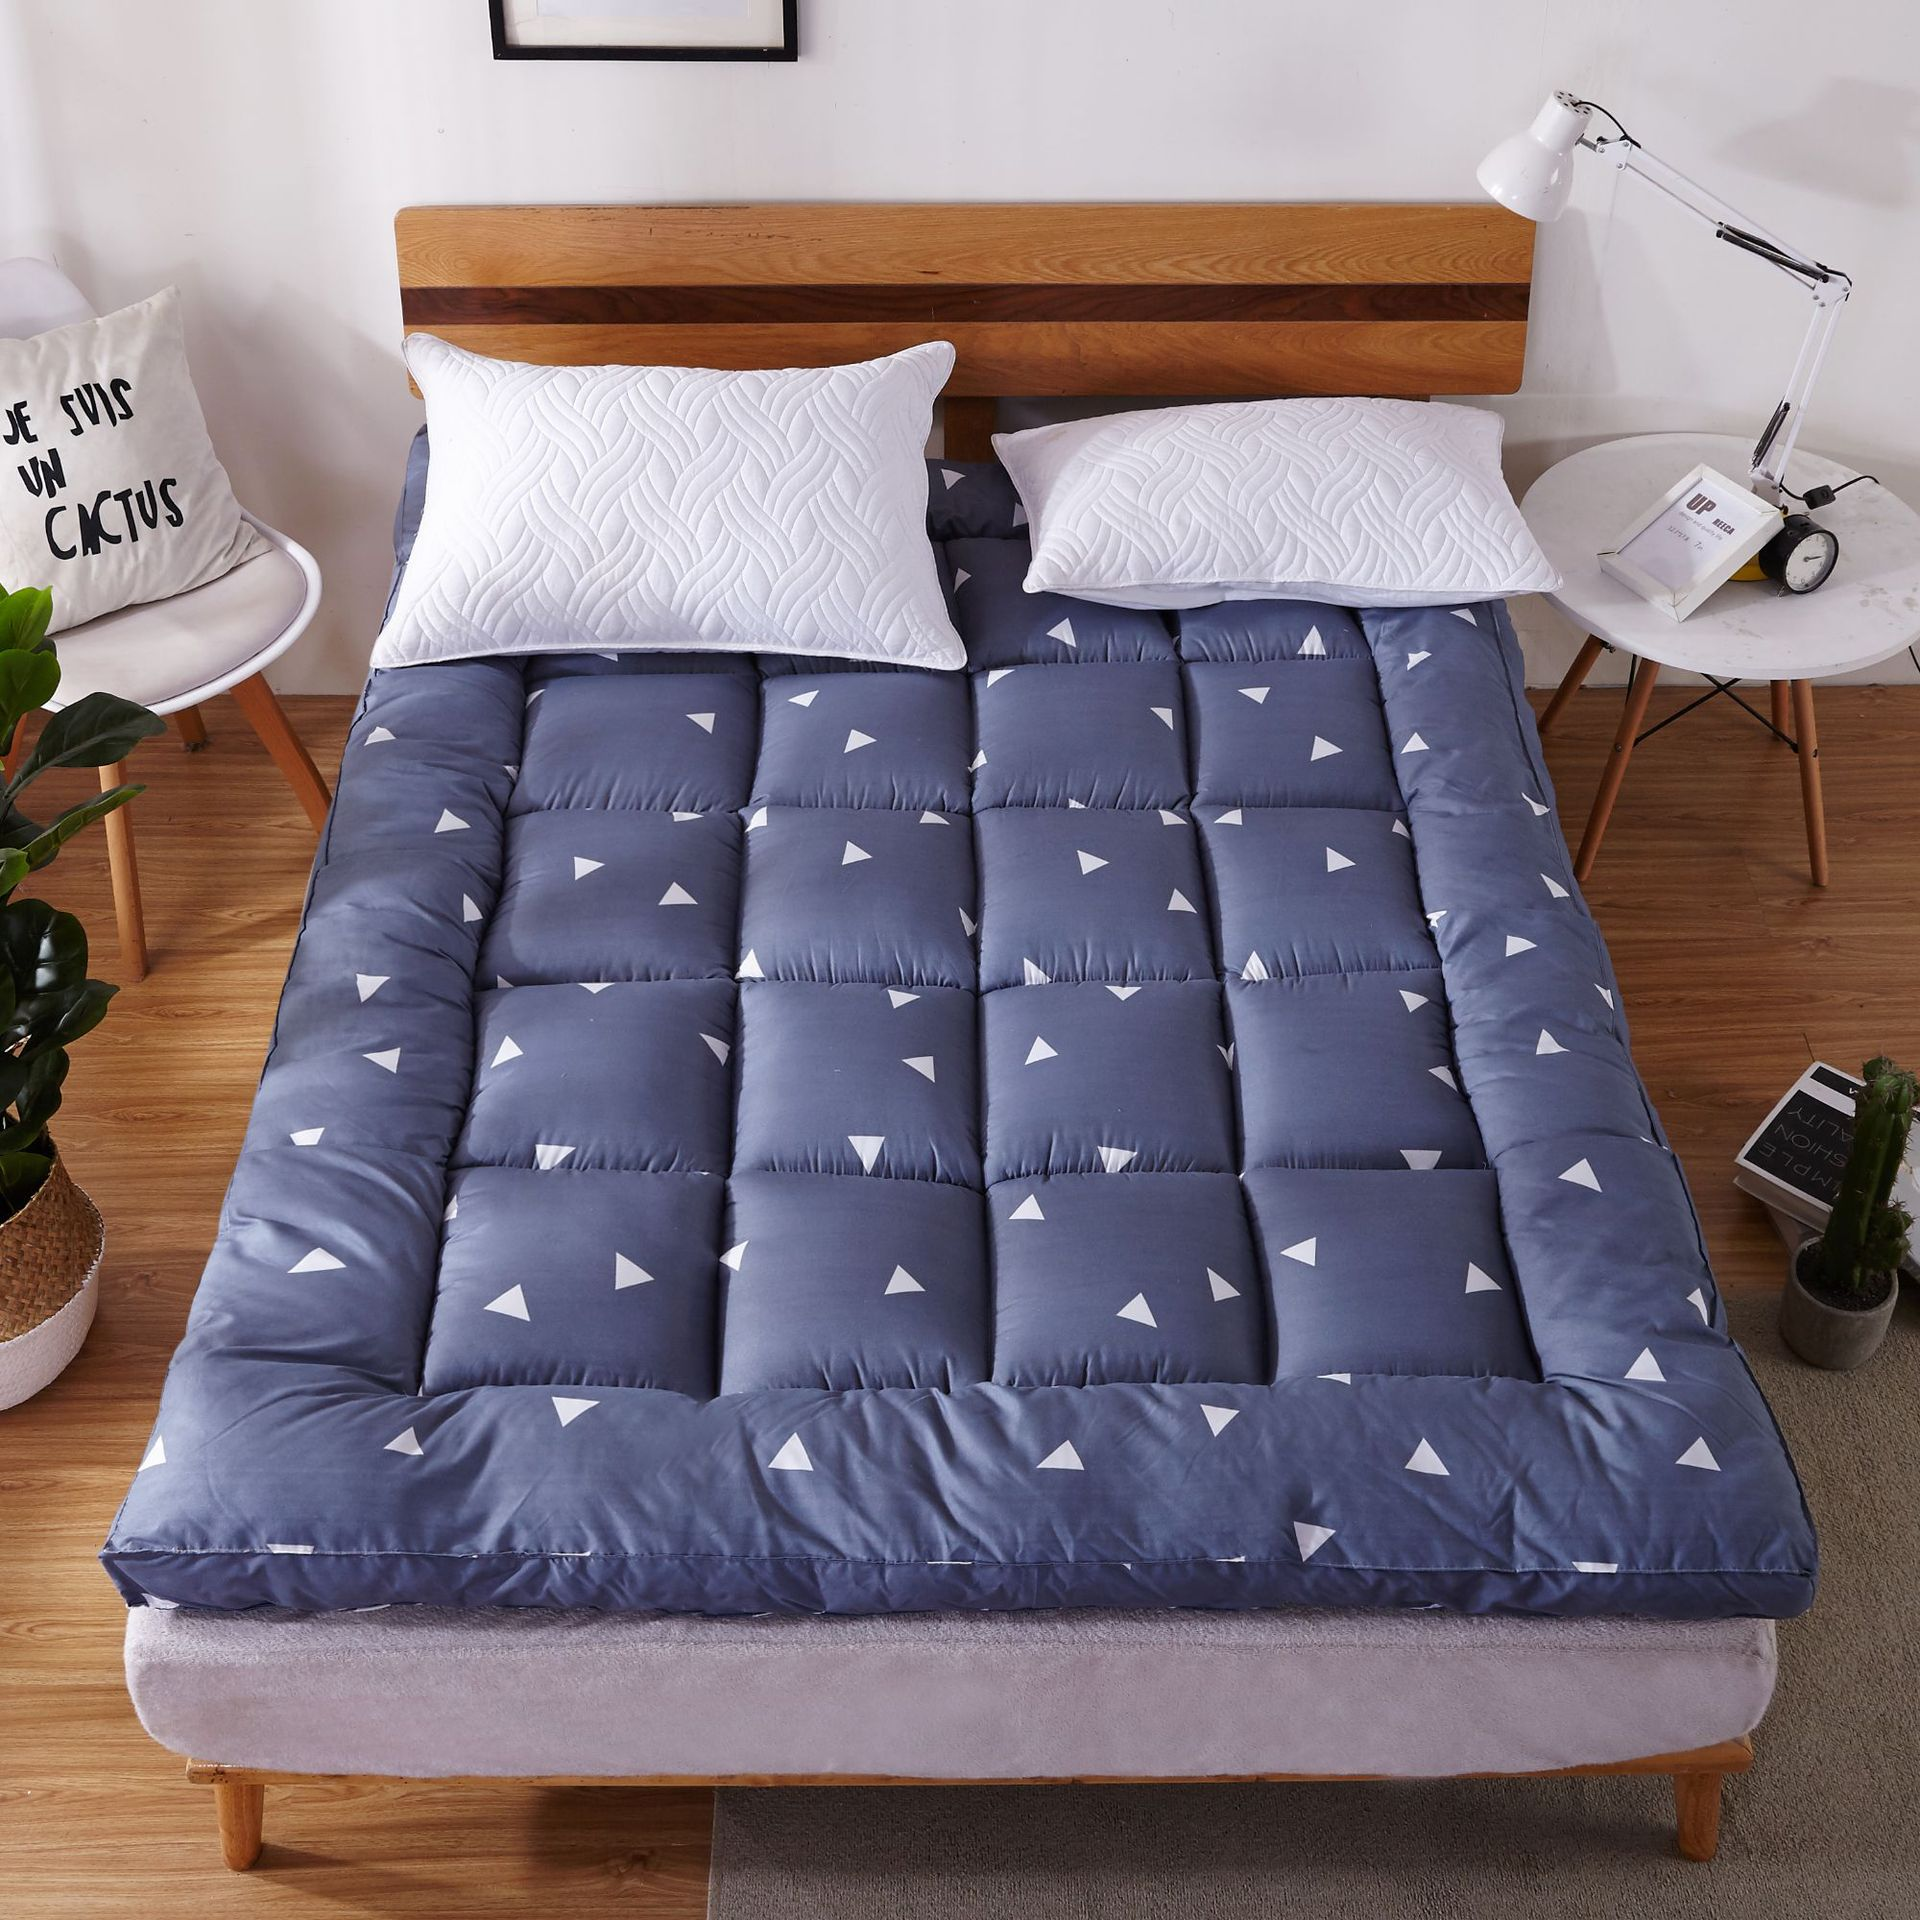 High Quality Hotel Mattress Thicken Keep Warm Tatami Mat Mattresses For Bedroom Sleeping On Floor Mat King Queen Twin Size